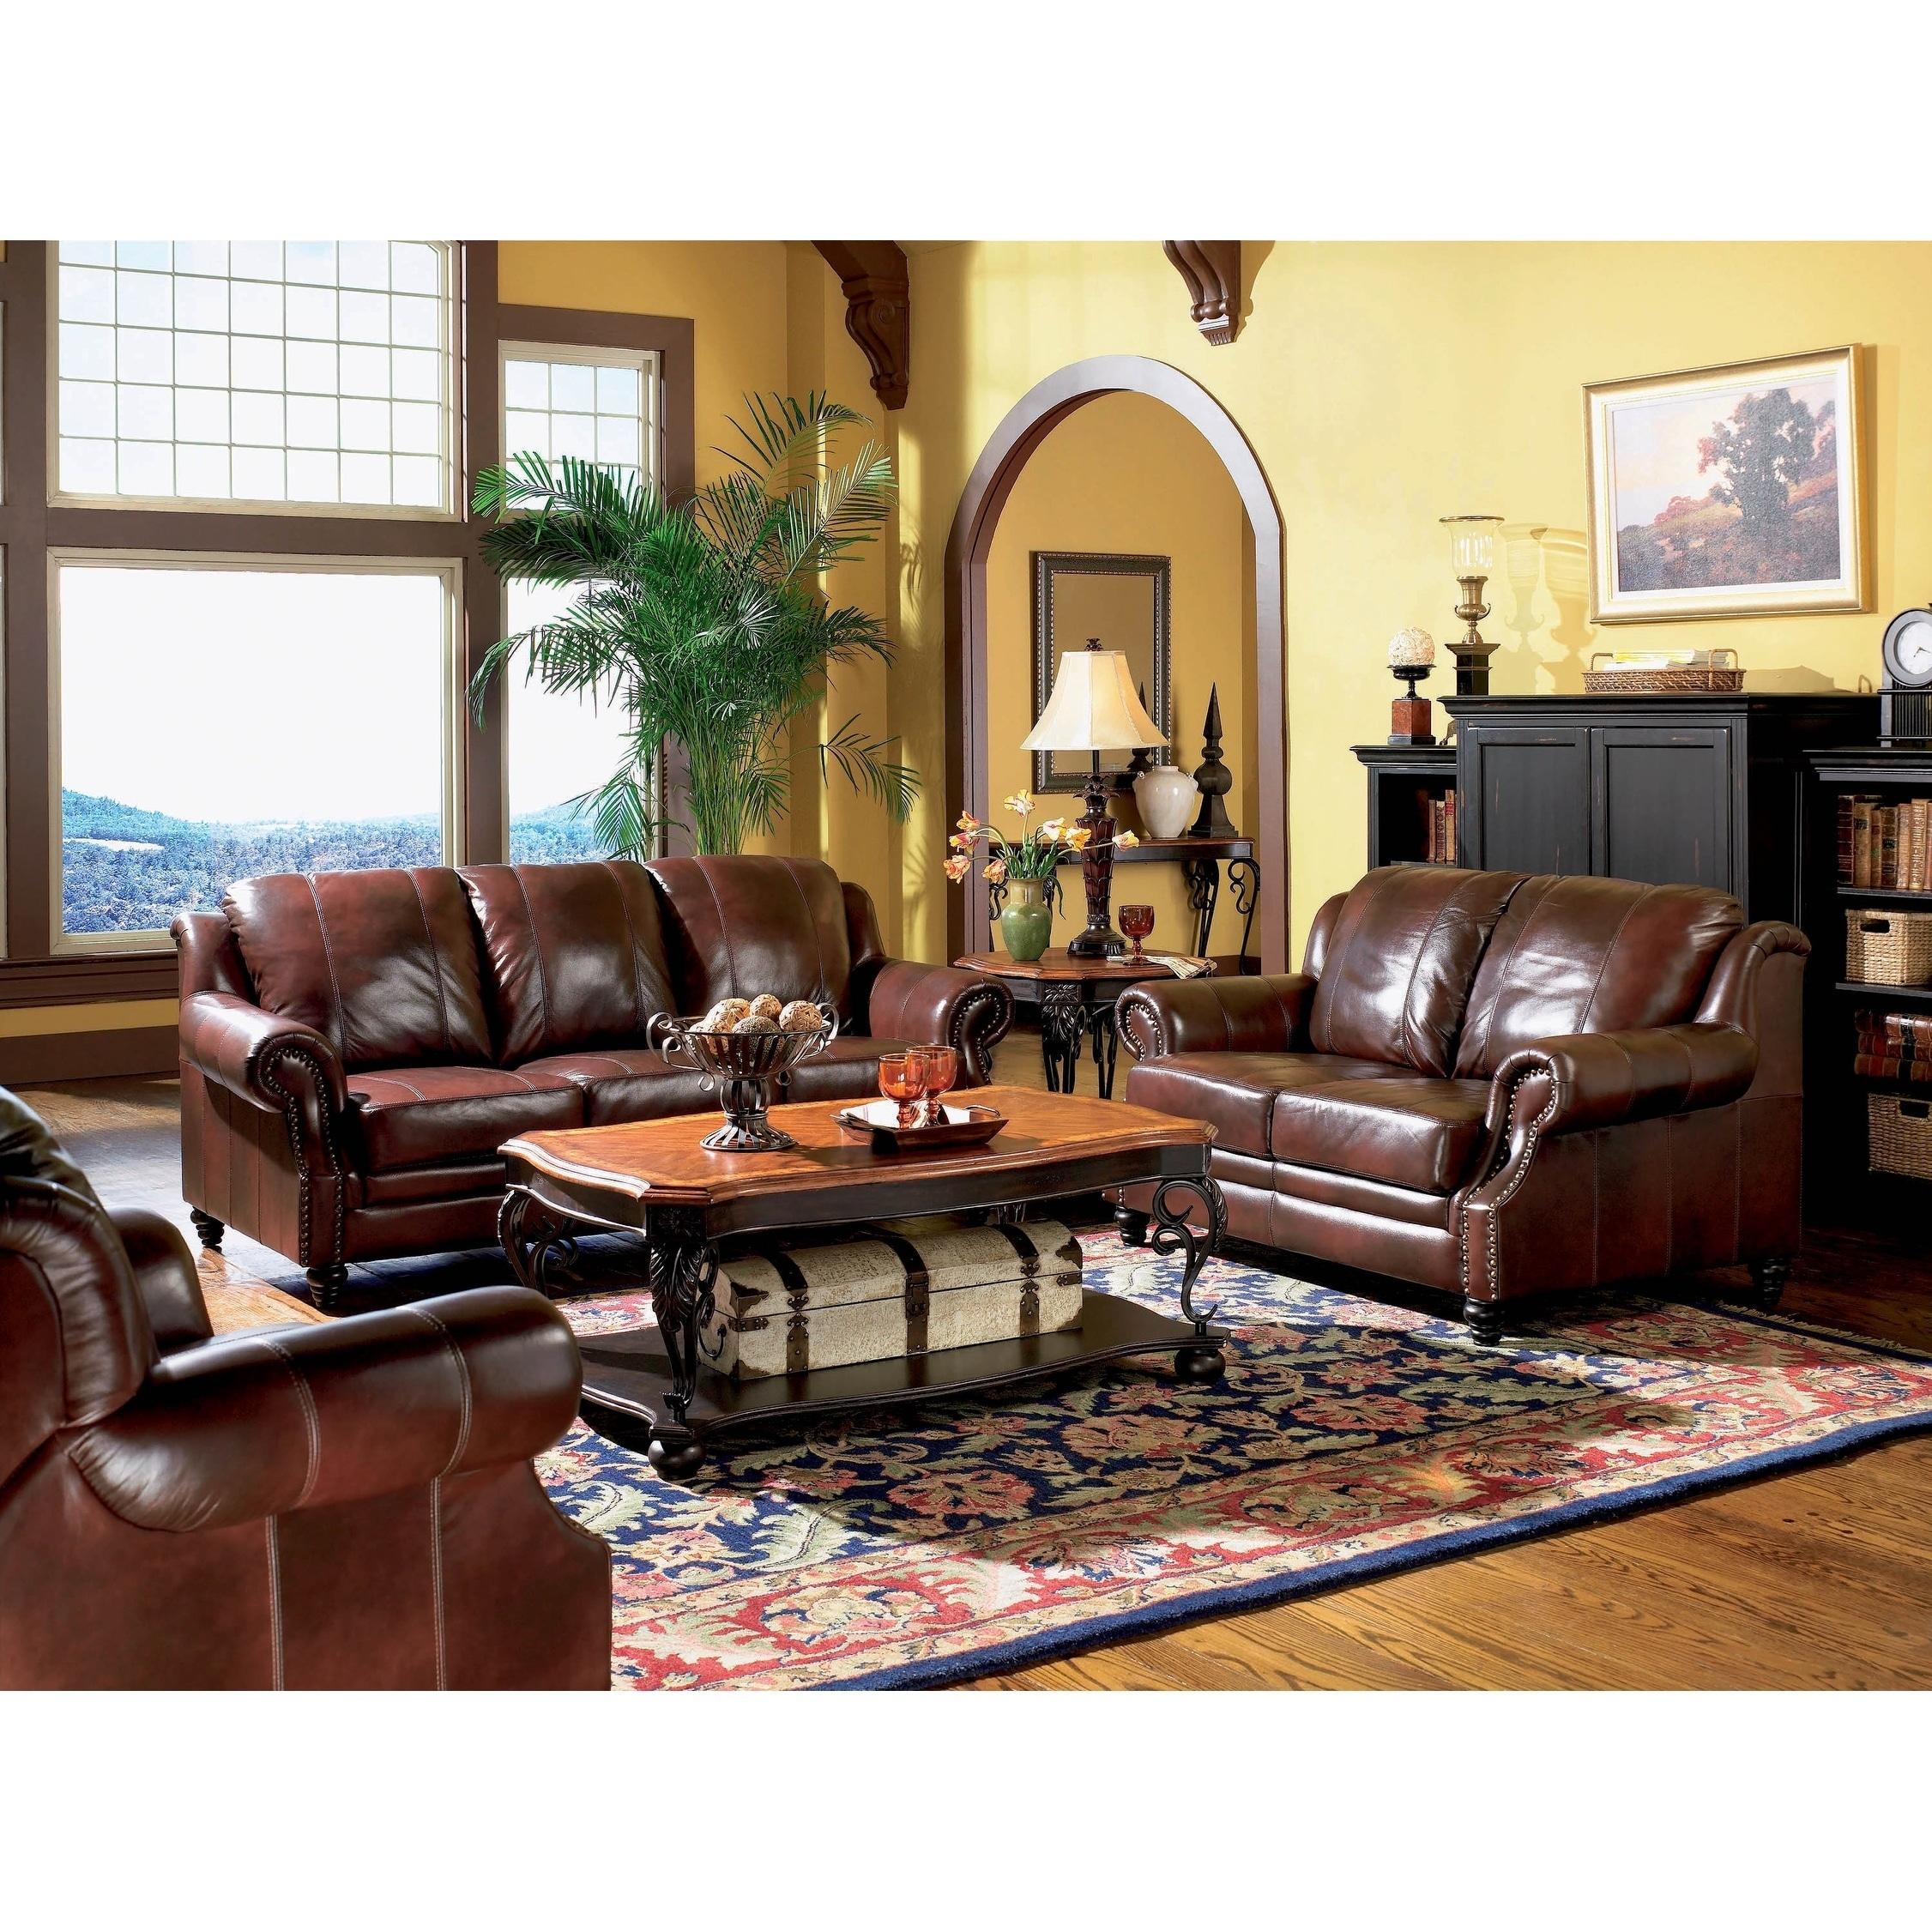 Verona Burgundy 3-piece Rolled Arm Living Room Set